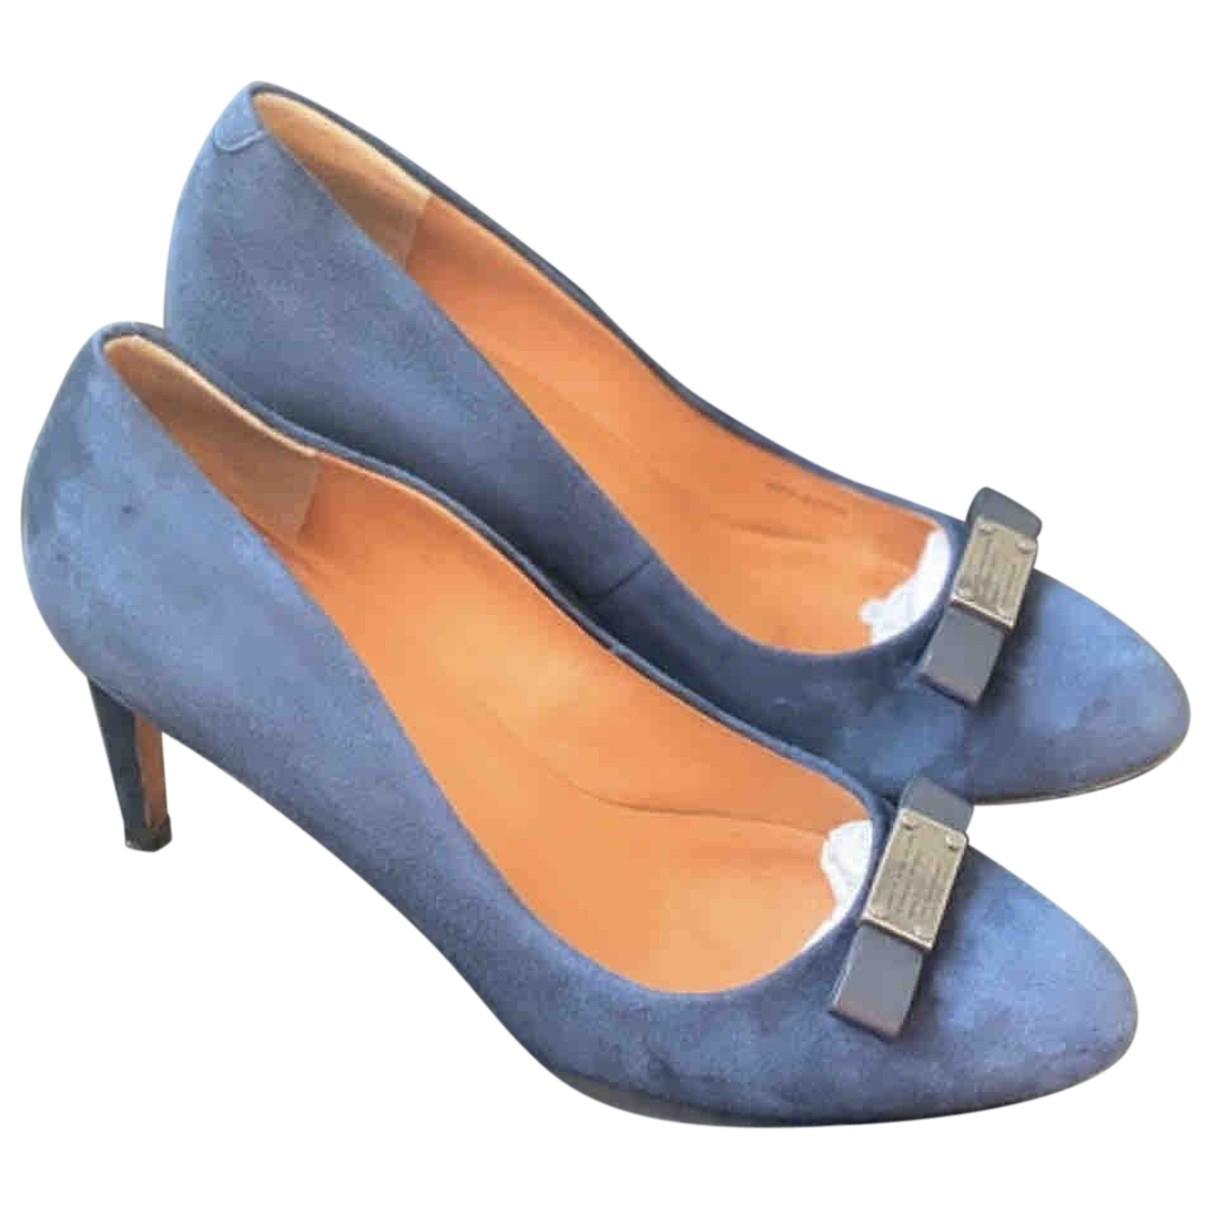 Marc By Marc Jacobs N Blue Suede Heels for Women 37.5 EU